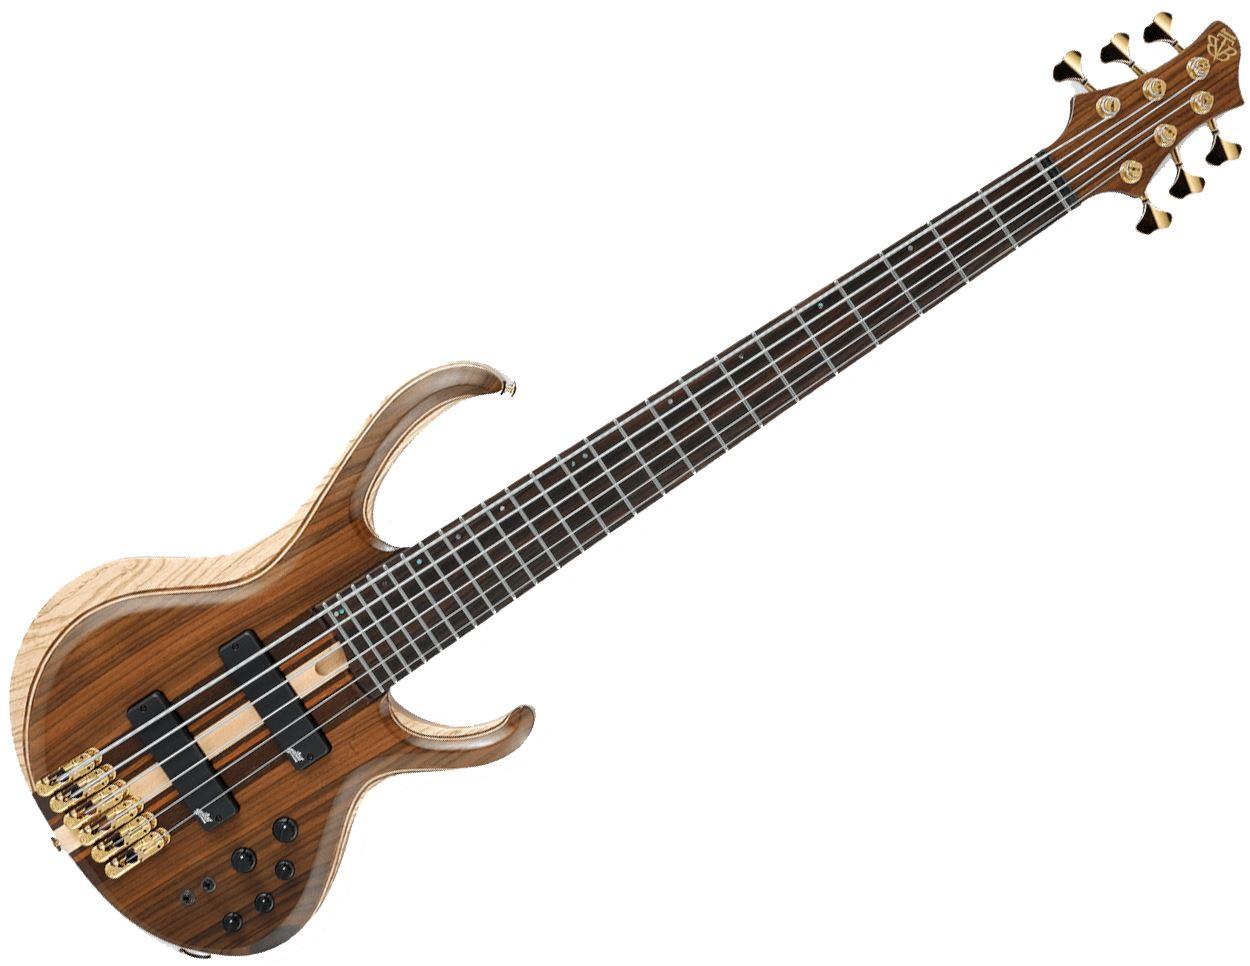 ibanez btb series bass guitars perth mega music online